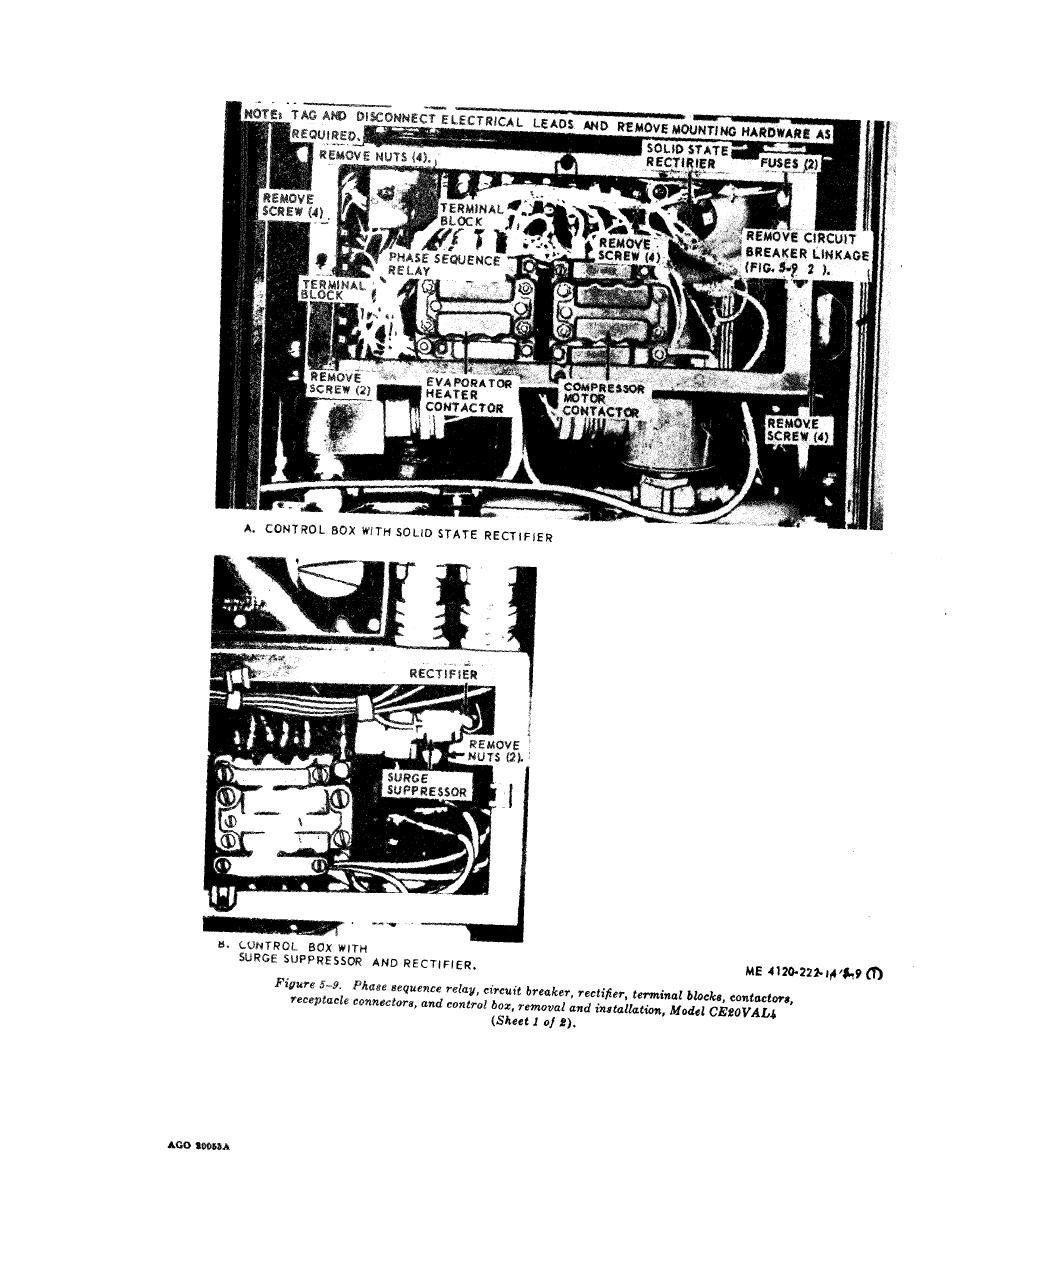 Figure 5 9 Phase Sequence Relay Circuit Breaker Rectifier Terminal Blocks Contractors